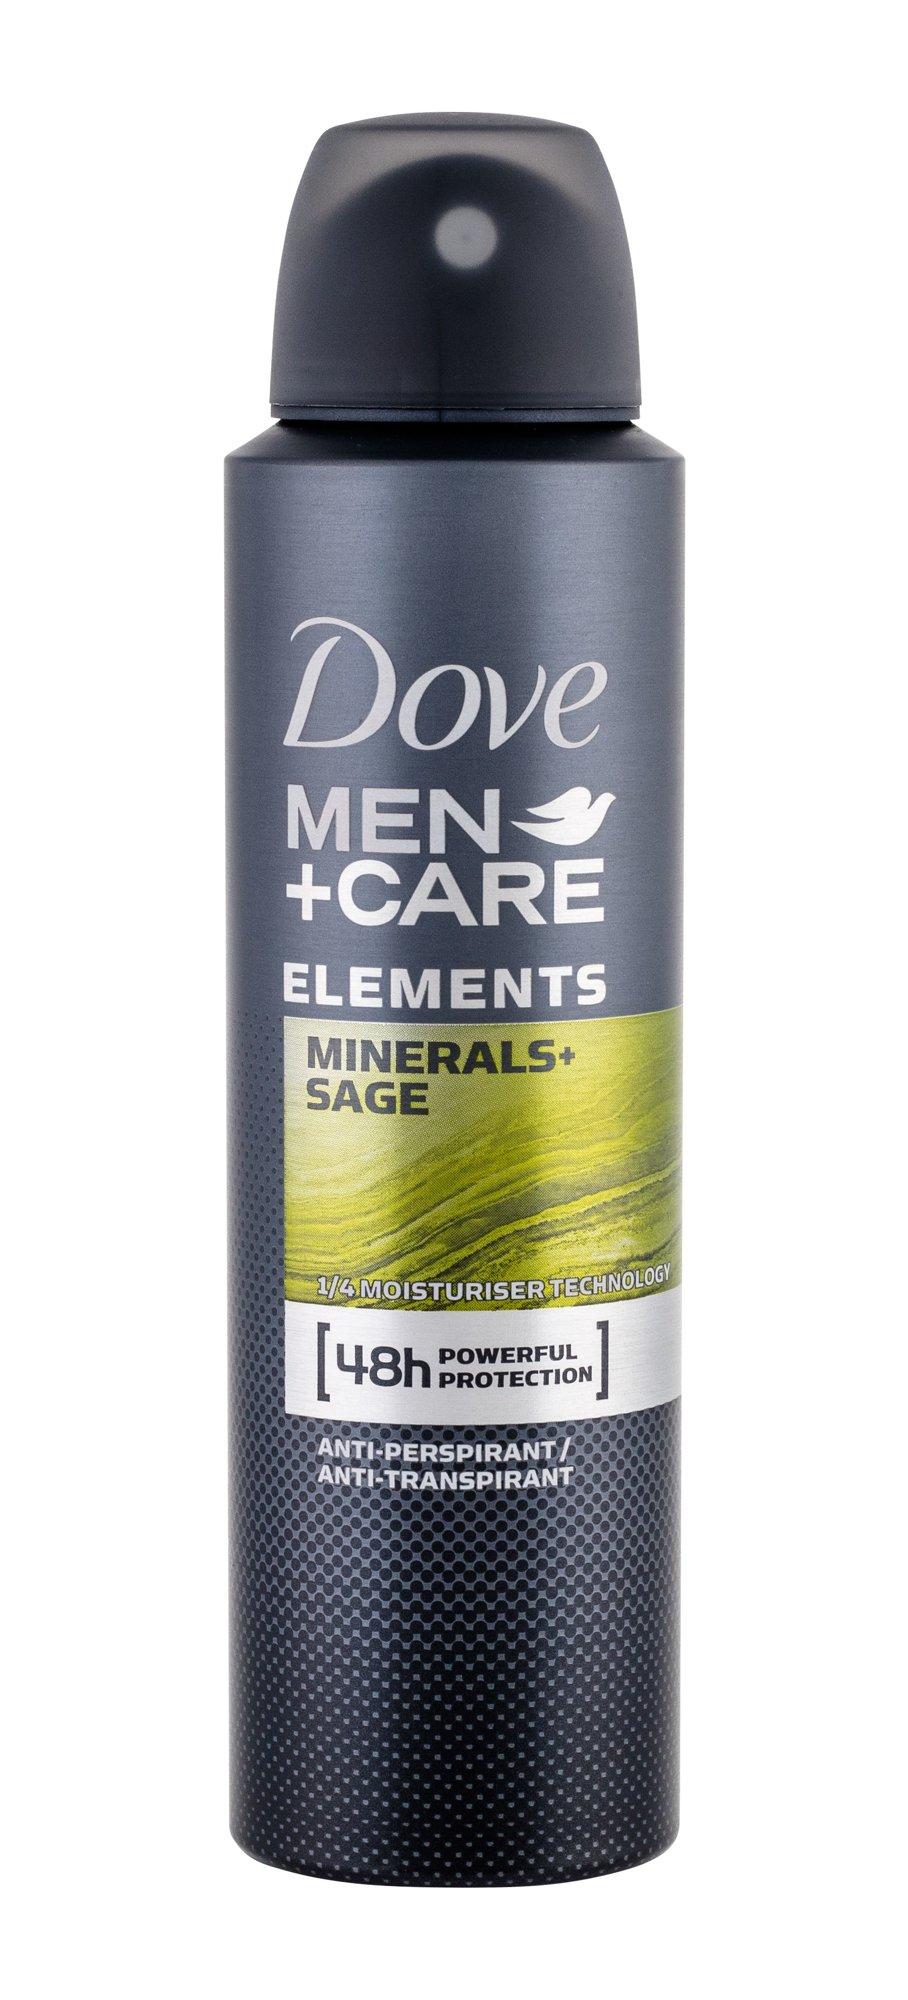 Dove Men + Care Antiperspirant 150ml  Minerals + Sage